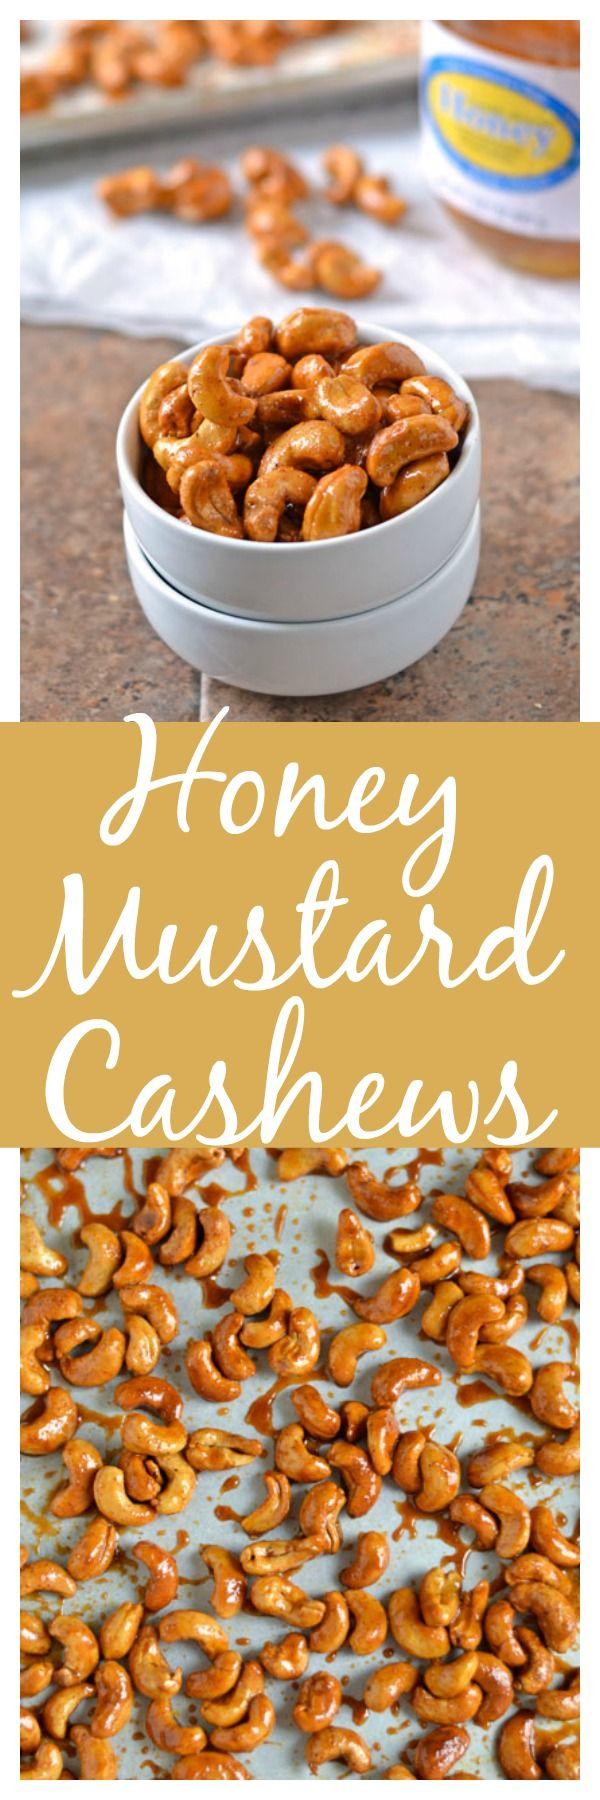 Honey Mustard Cashews. A little honey and heat make these cashews absolutely irresistible!